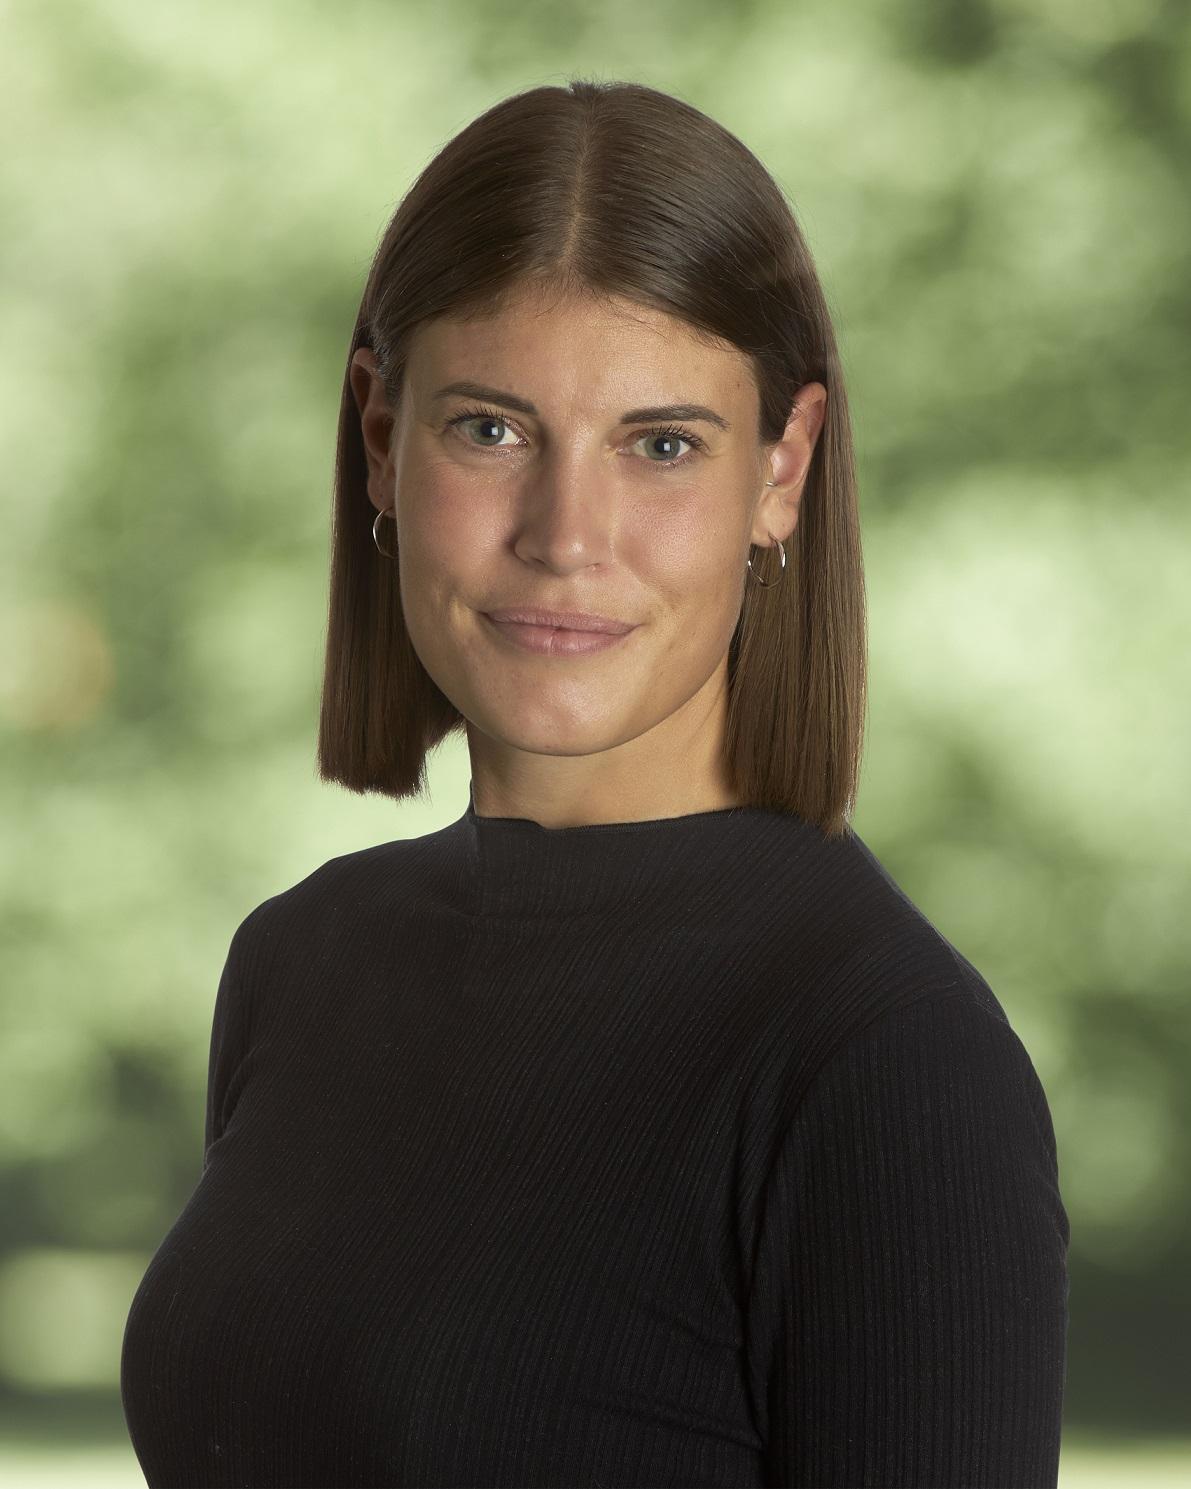 Trine Roungkvist